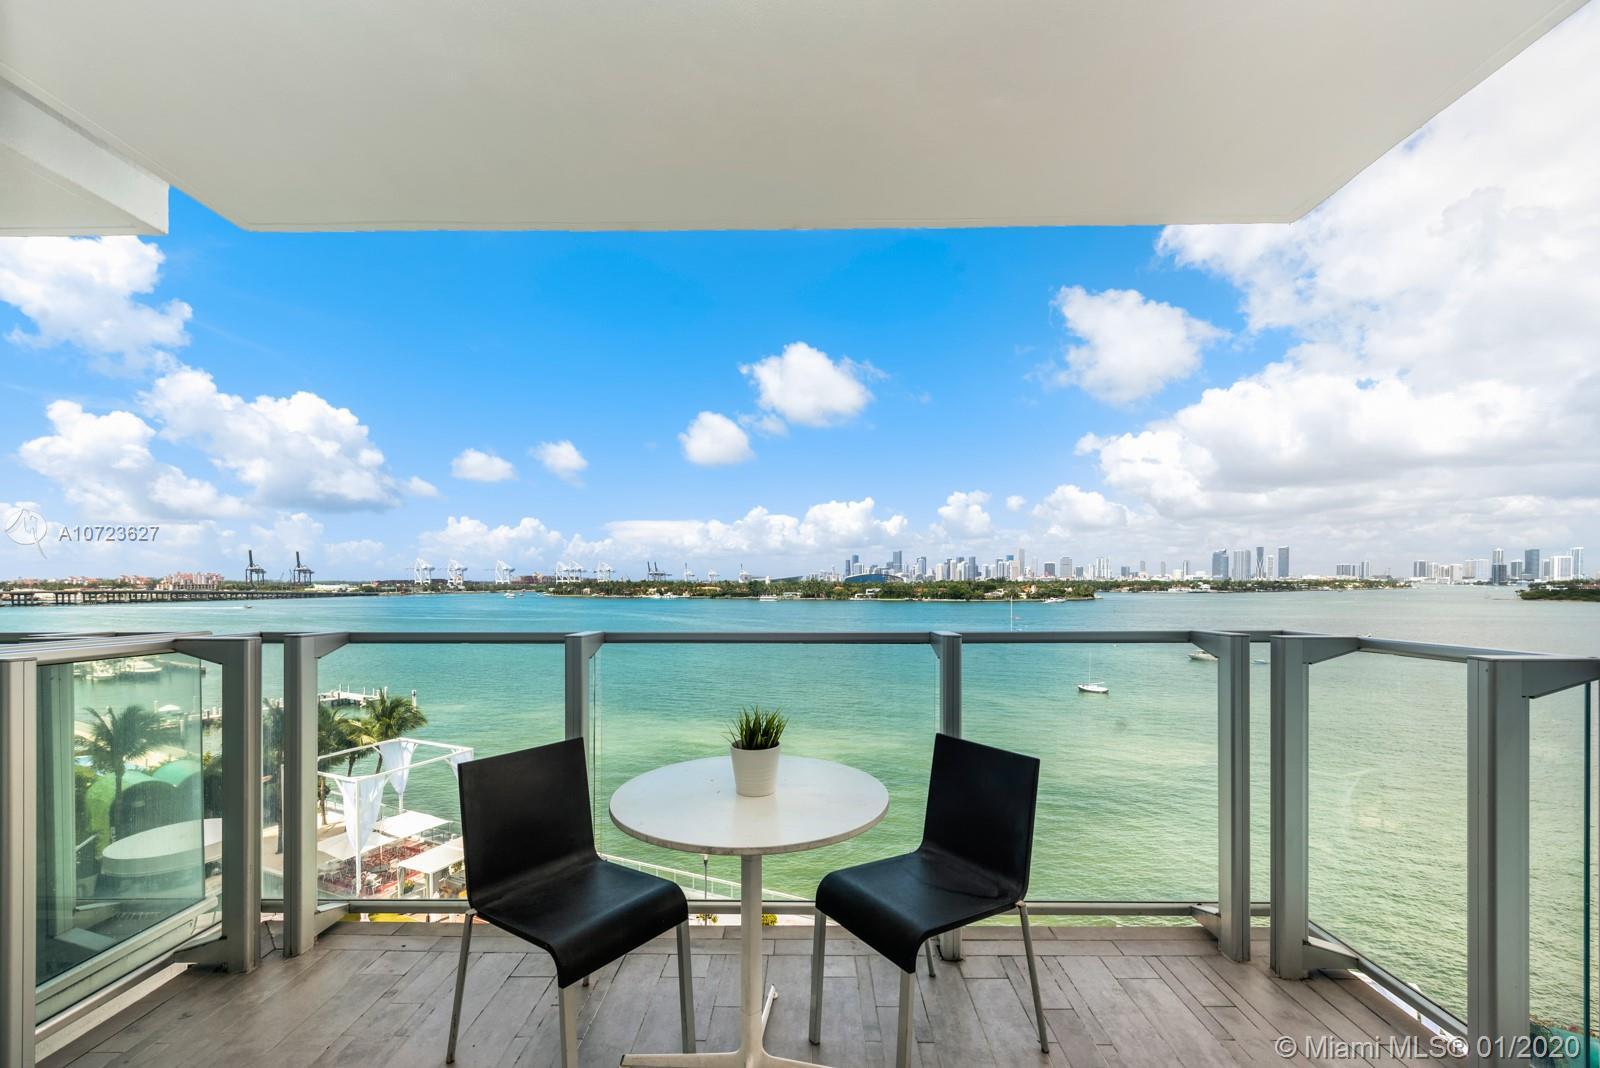 1100 West Ave #716, Miami Beach, FL 33139 - Miami Beach, FL real estate listing